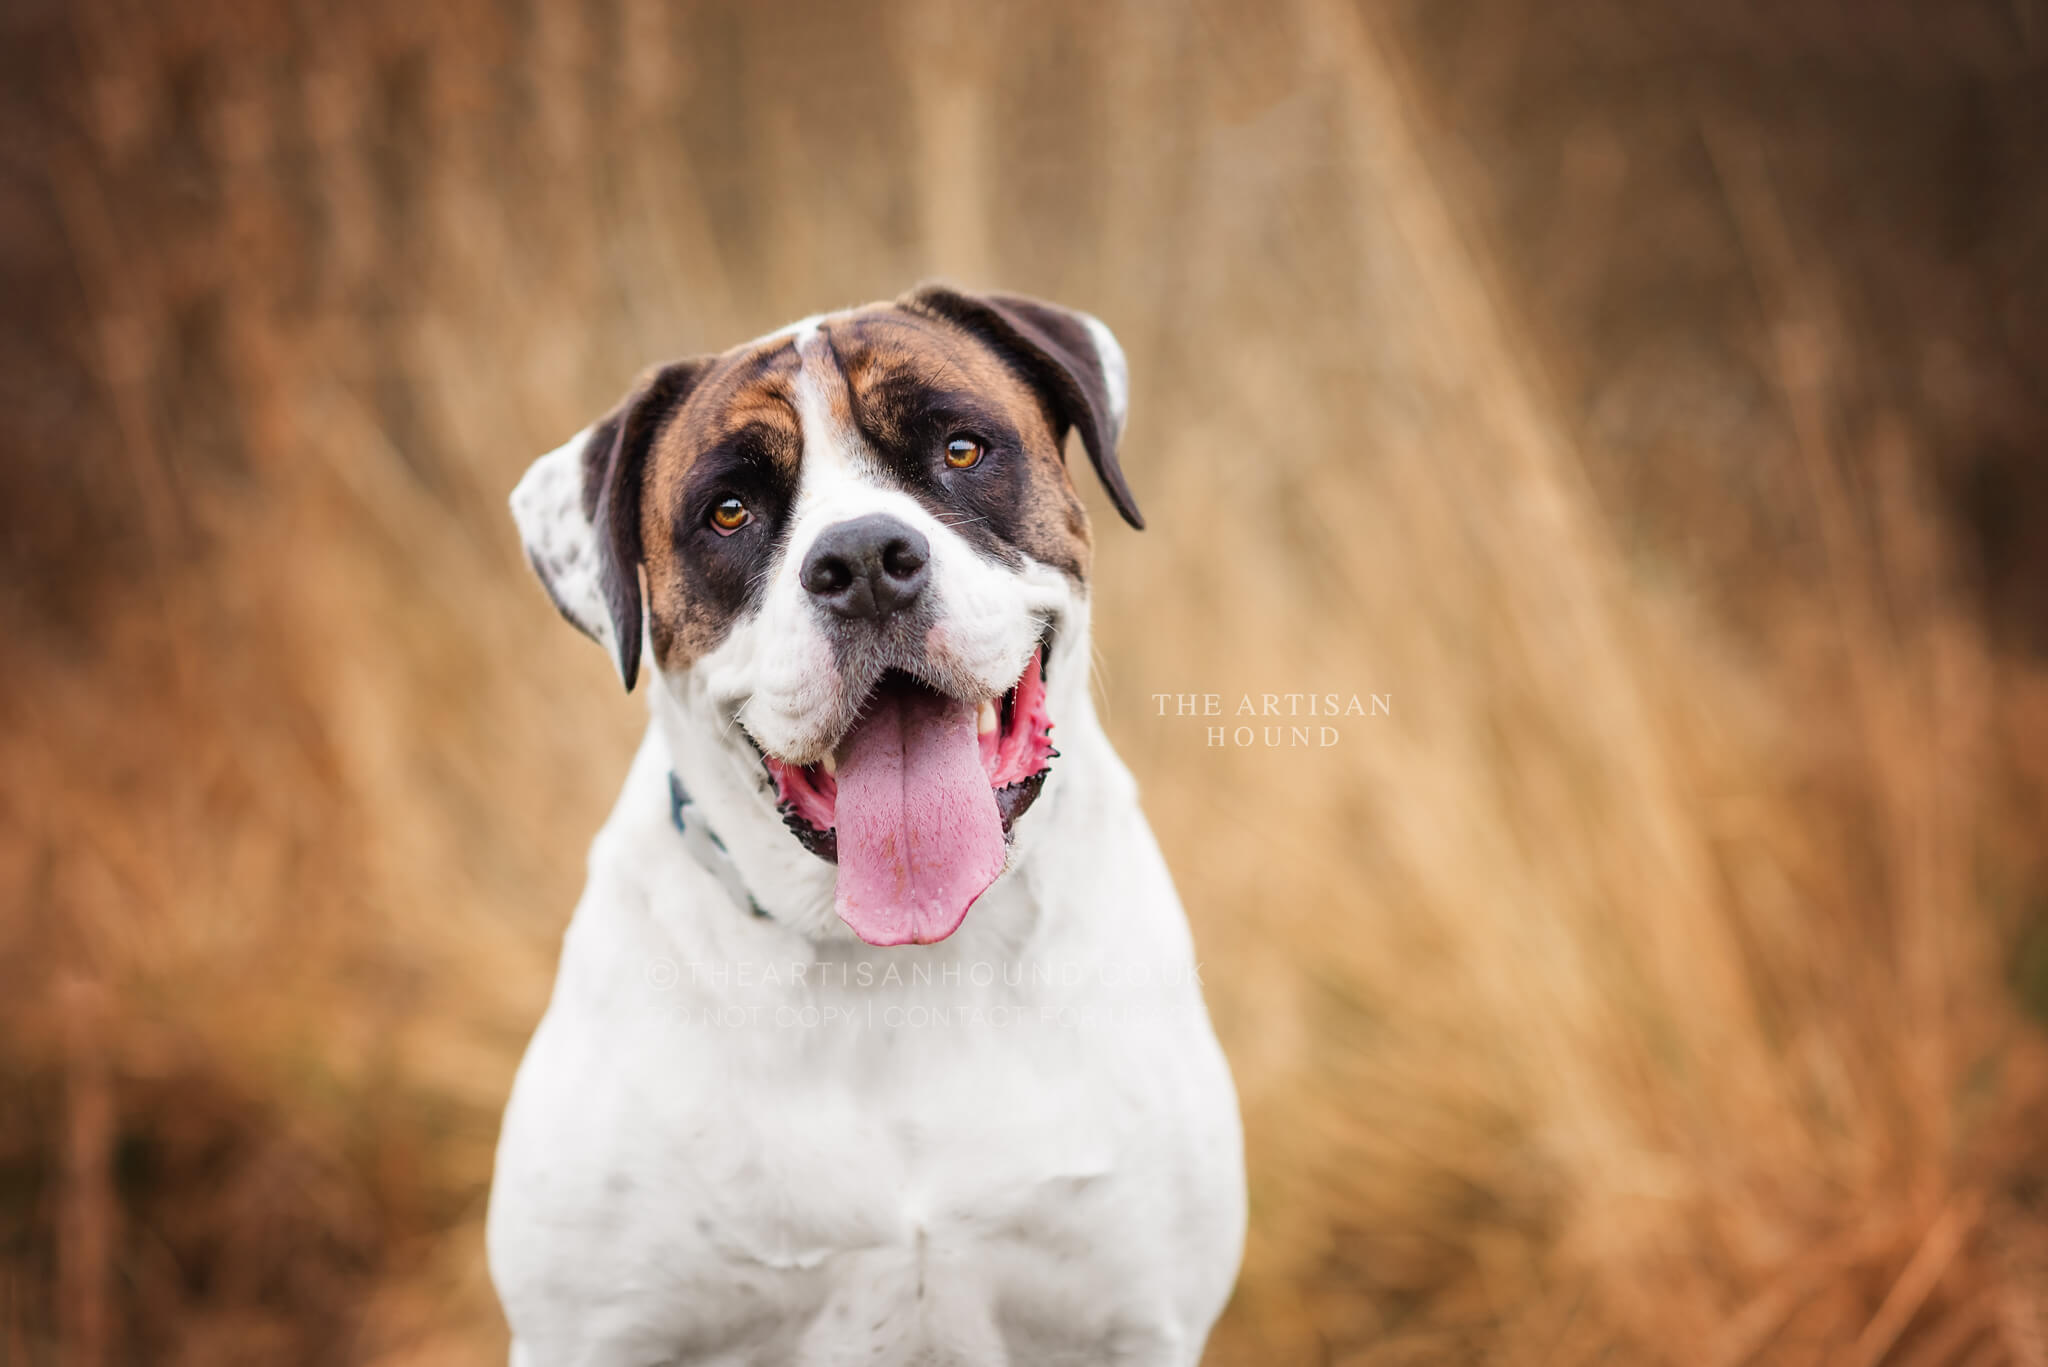 Bulldog sitting in front of grass looking at camera